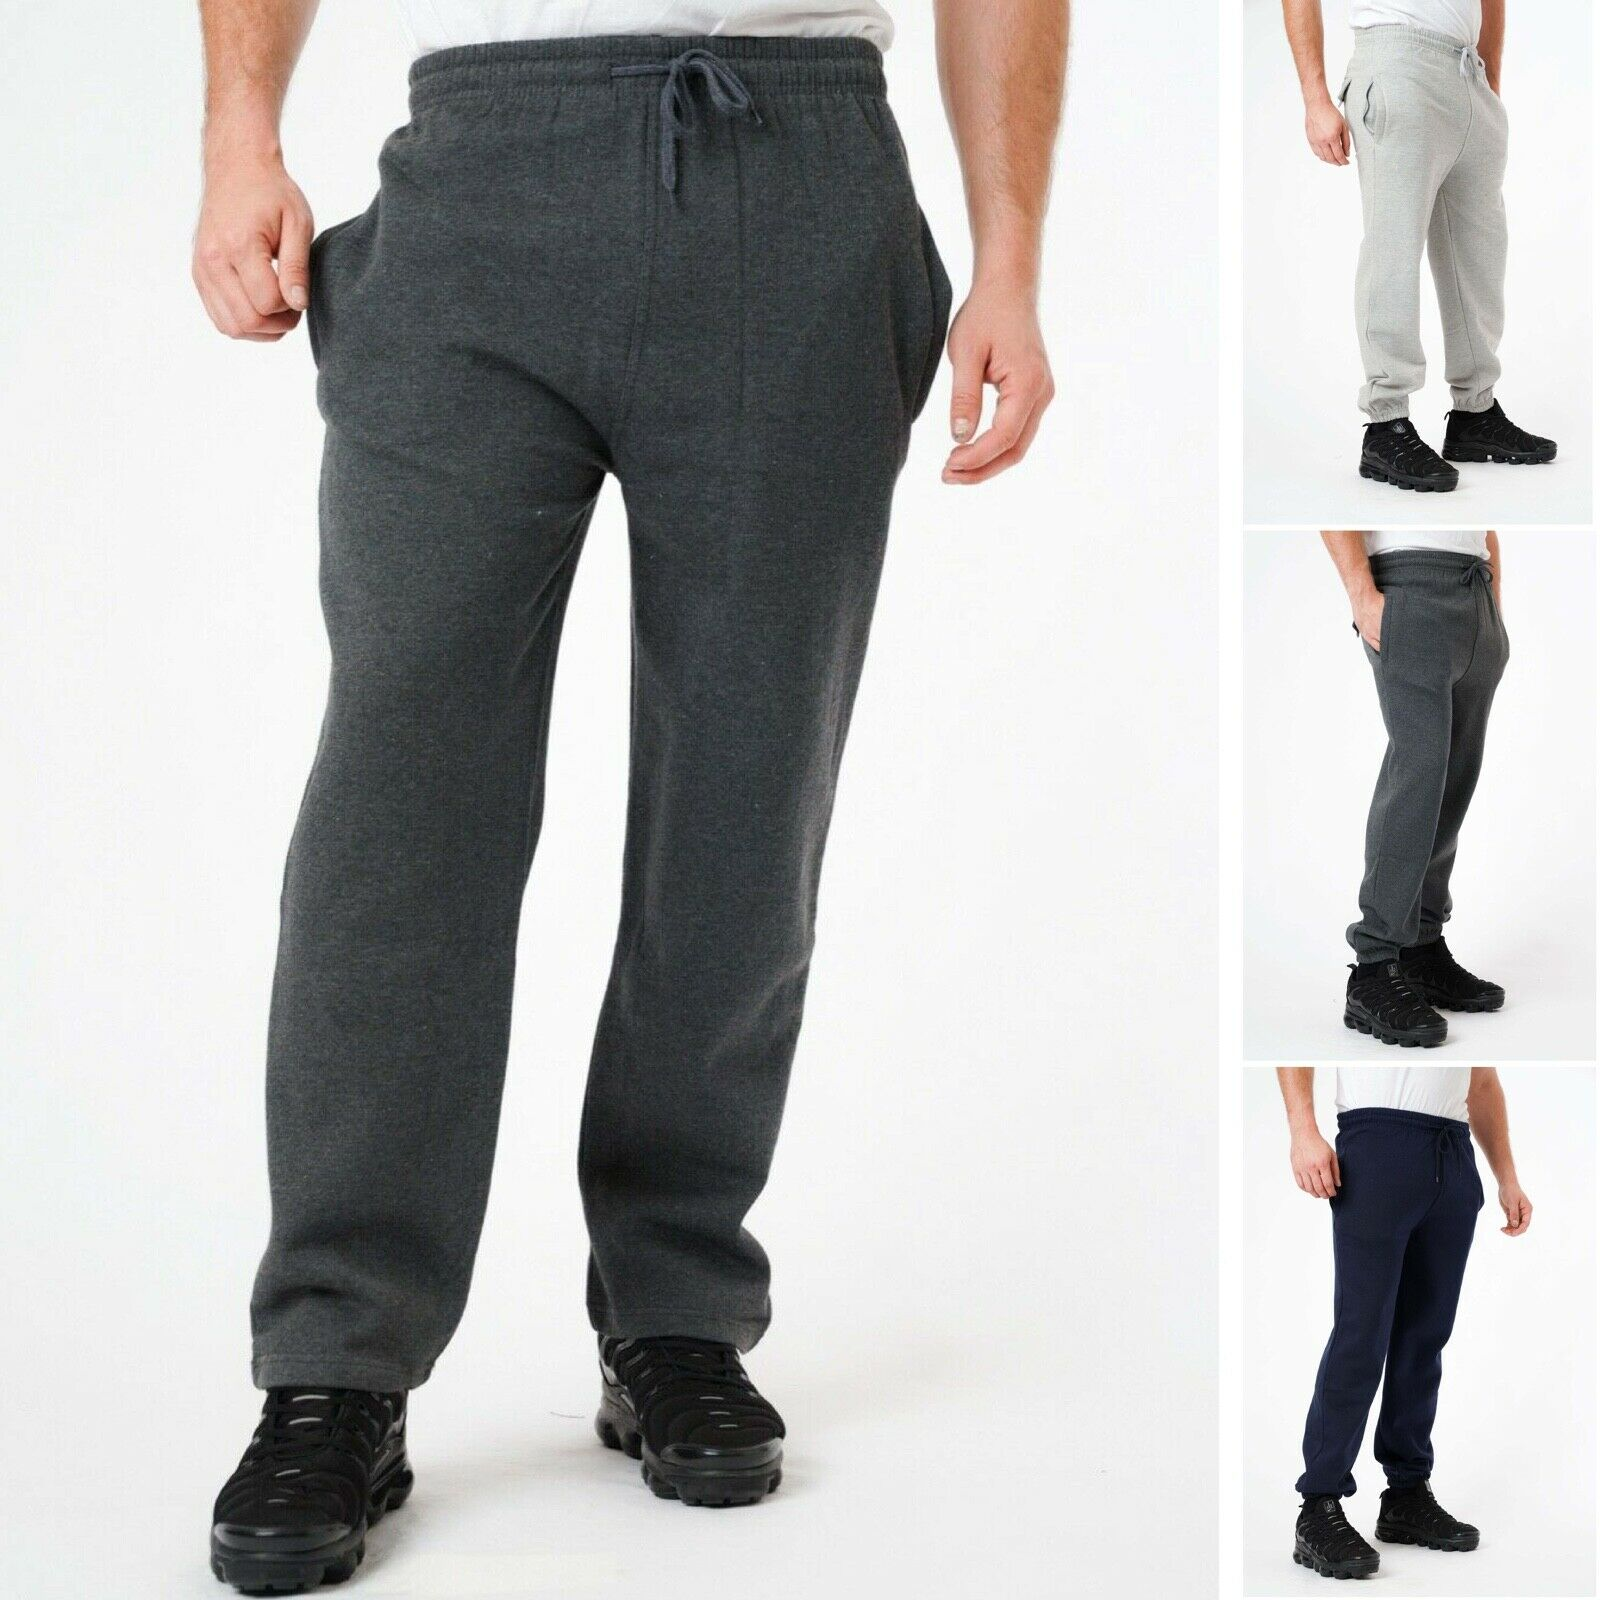 Mens Fleece Joggers 3XL-8XL Plus Size Big Size King Bottoms Plain Pants Trousers